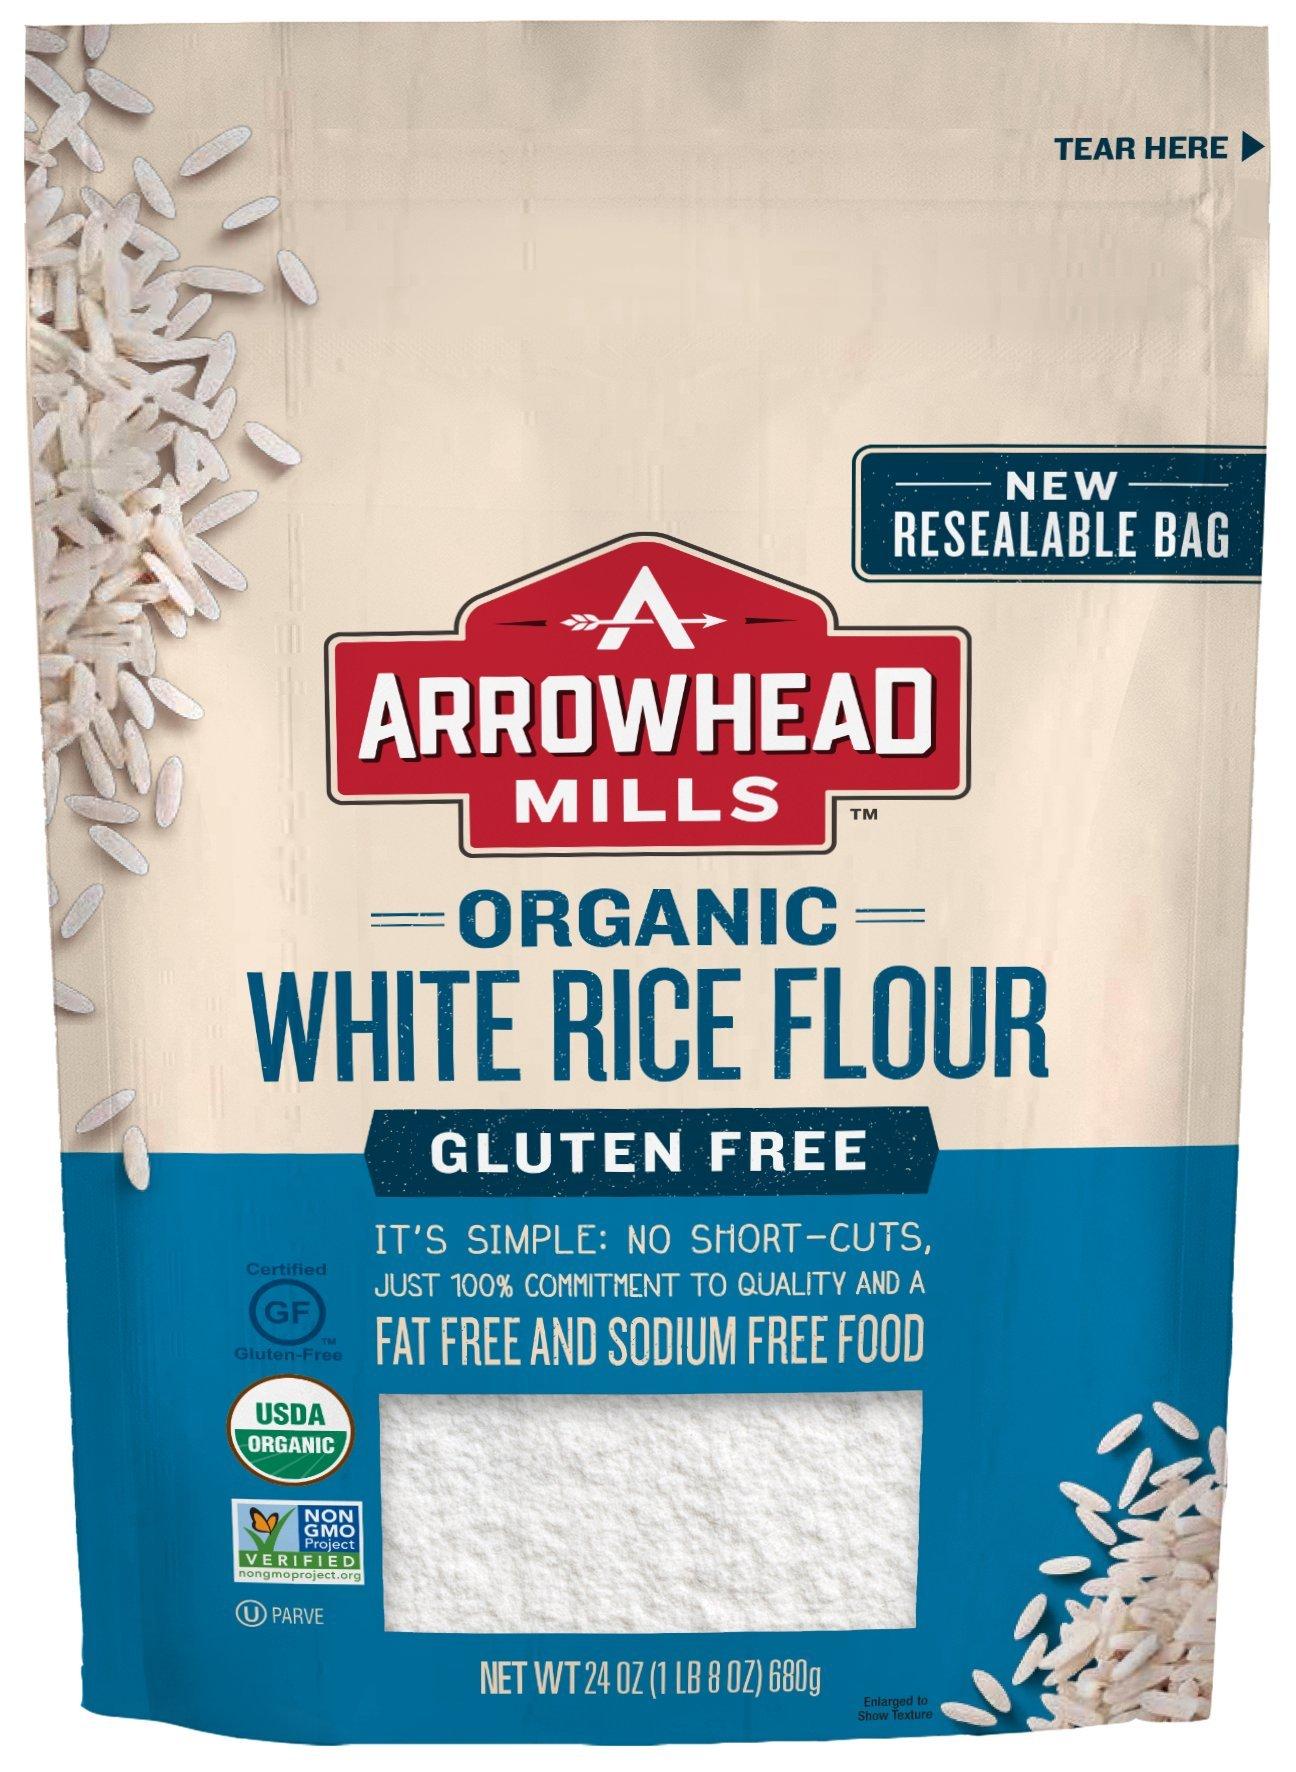 Arrowhead Mills Organic Gluten-Free White Rice Flour, 24 oz. Bag (Pack of 6)